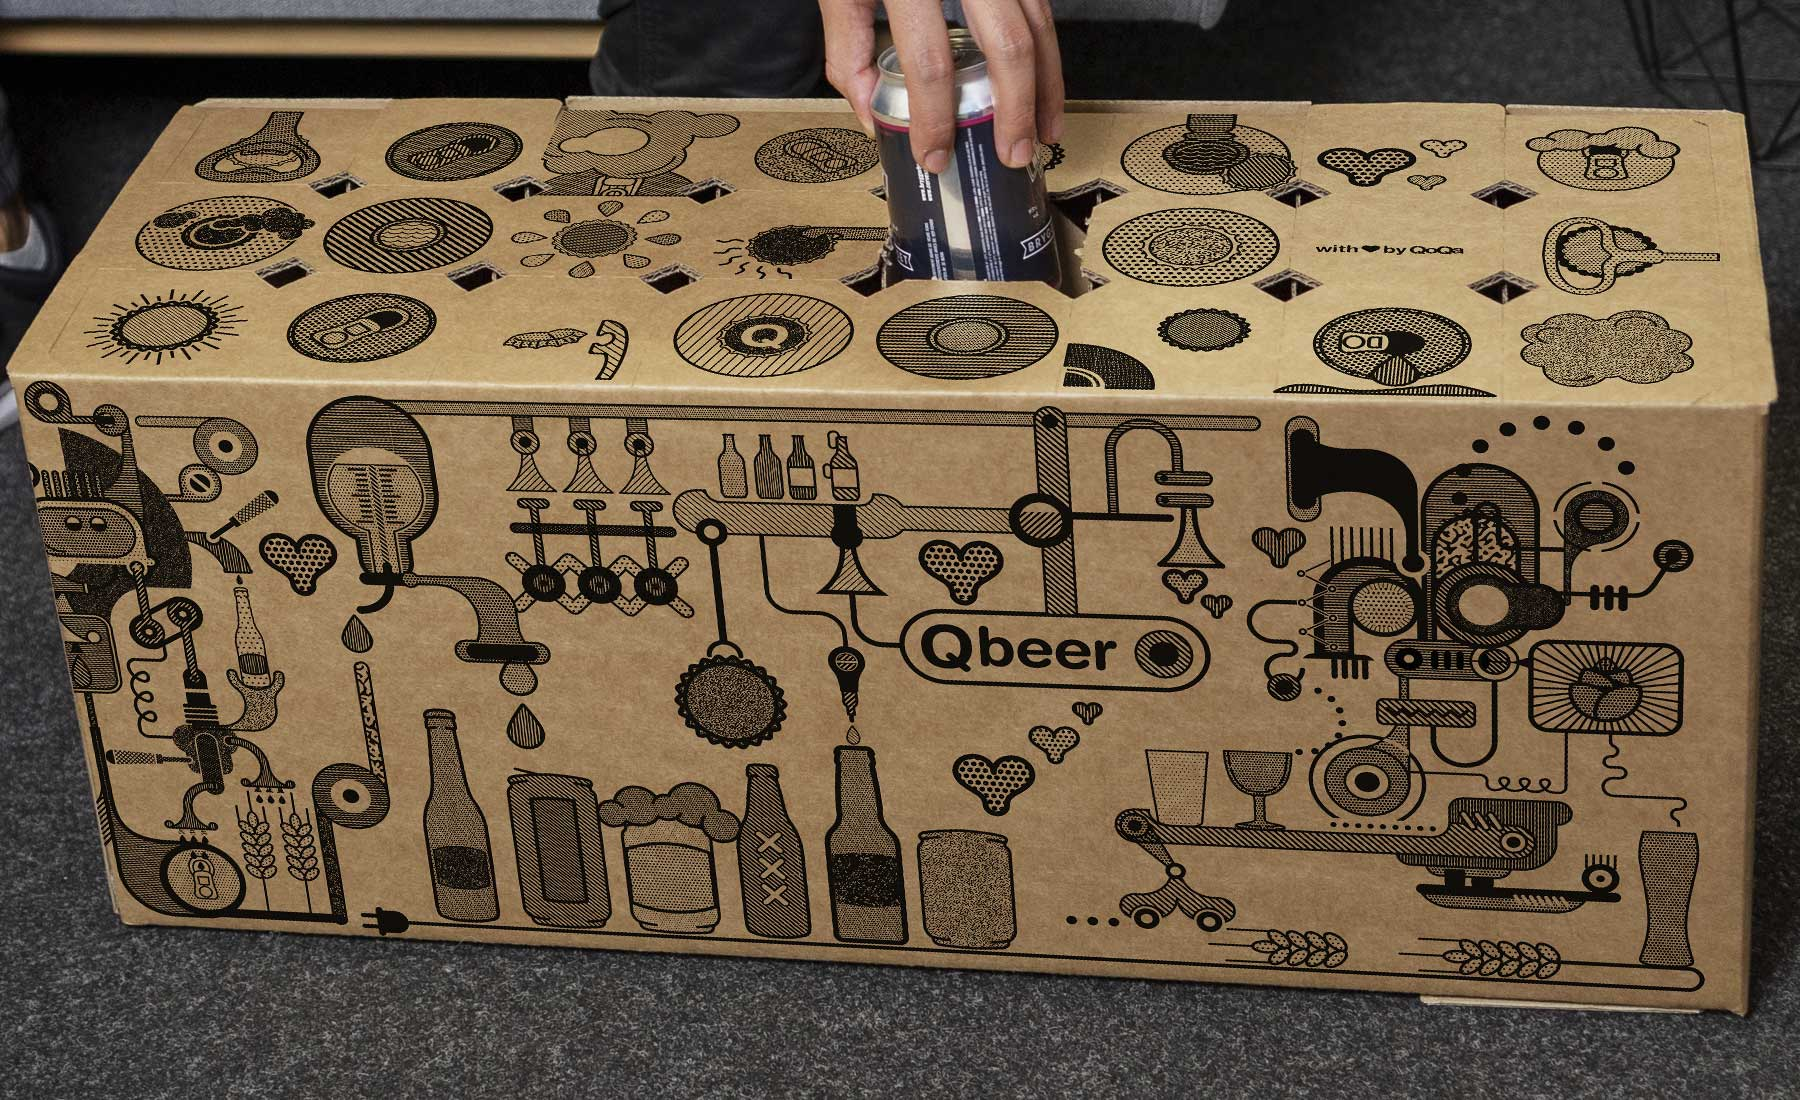 Carton Qbeer